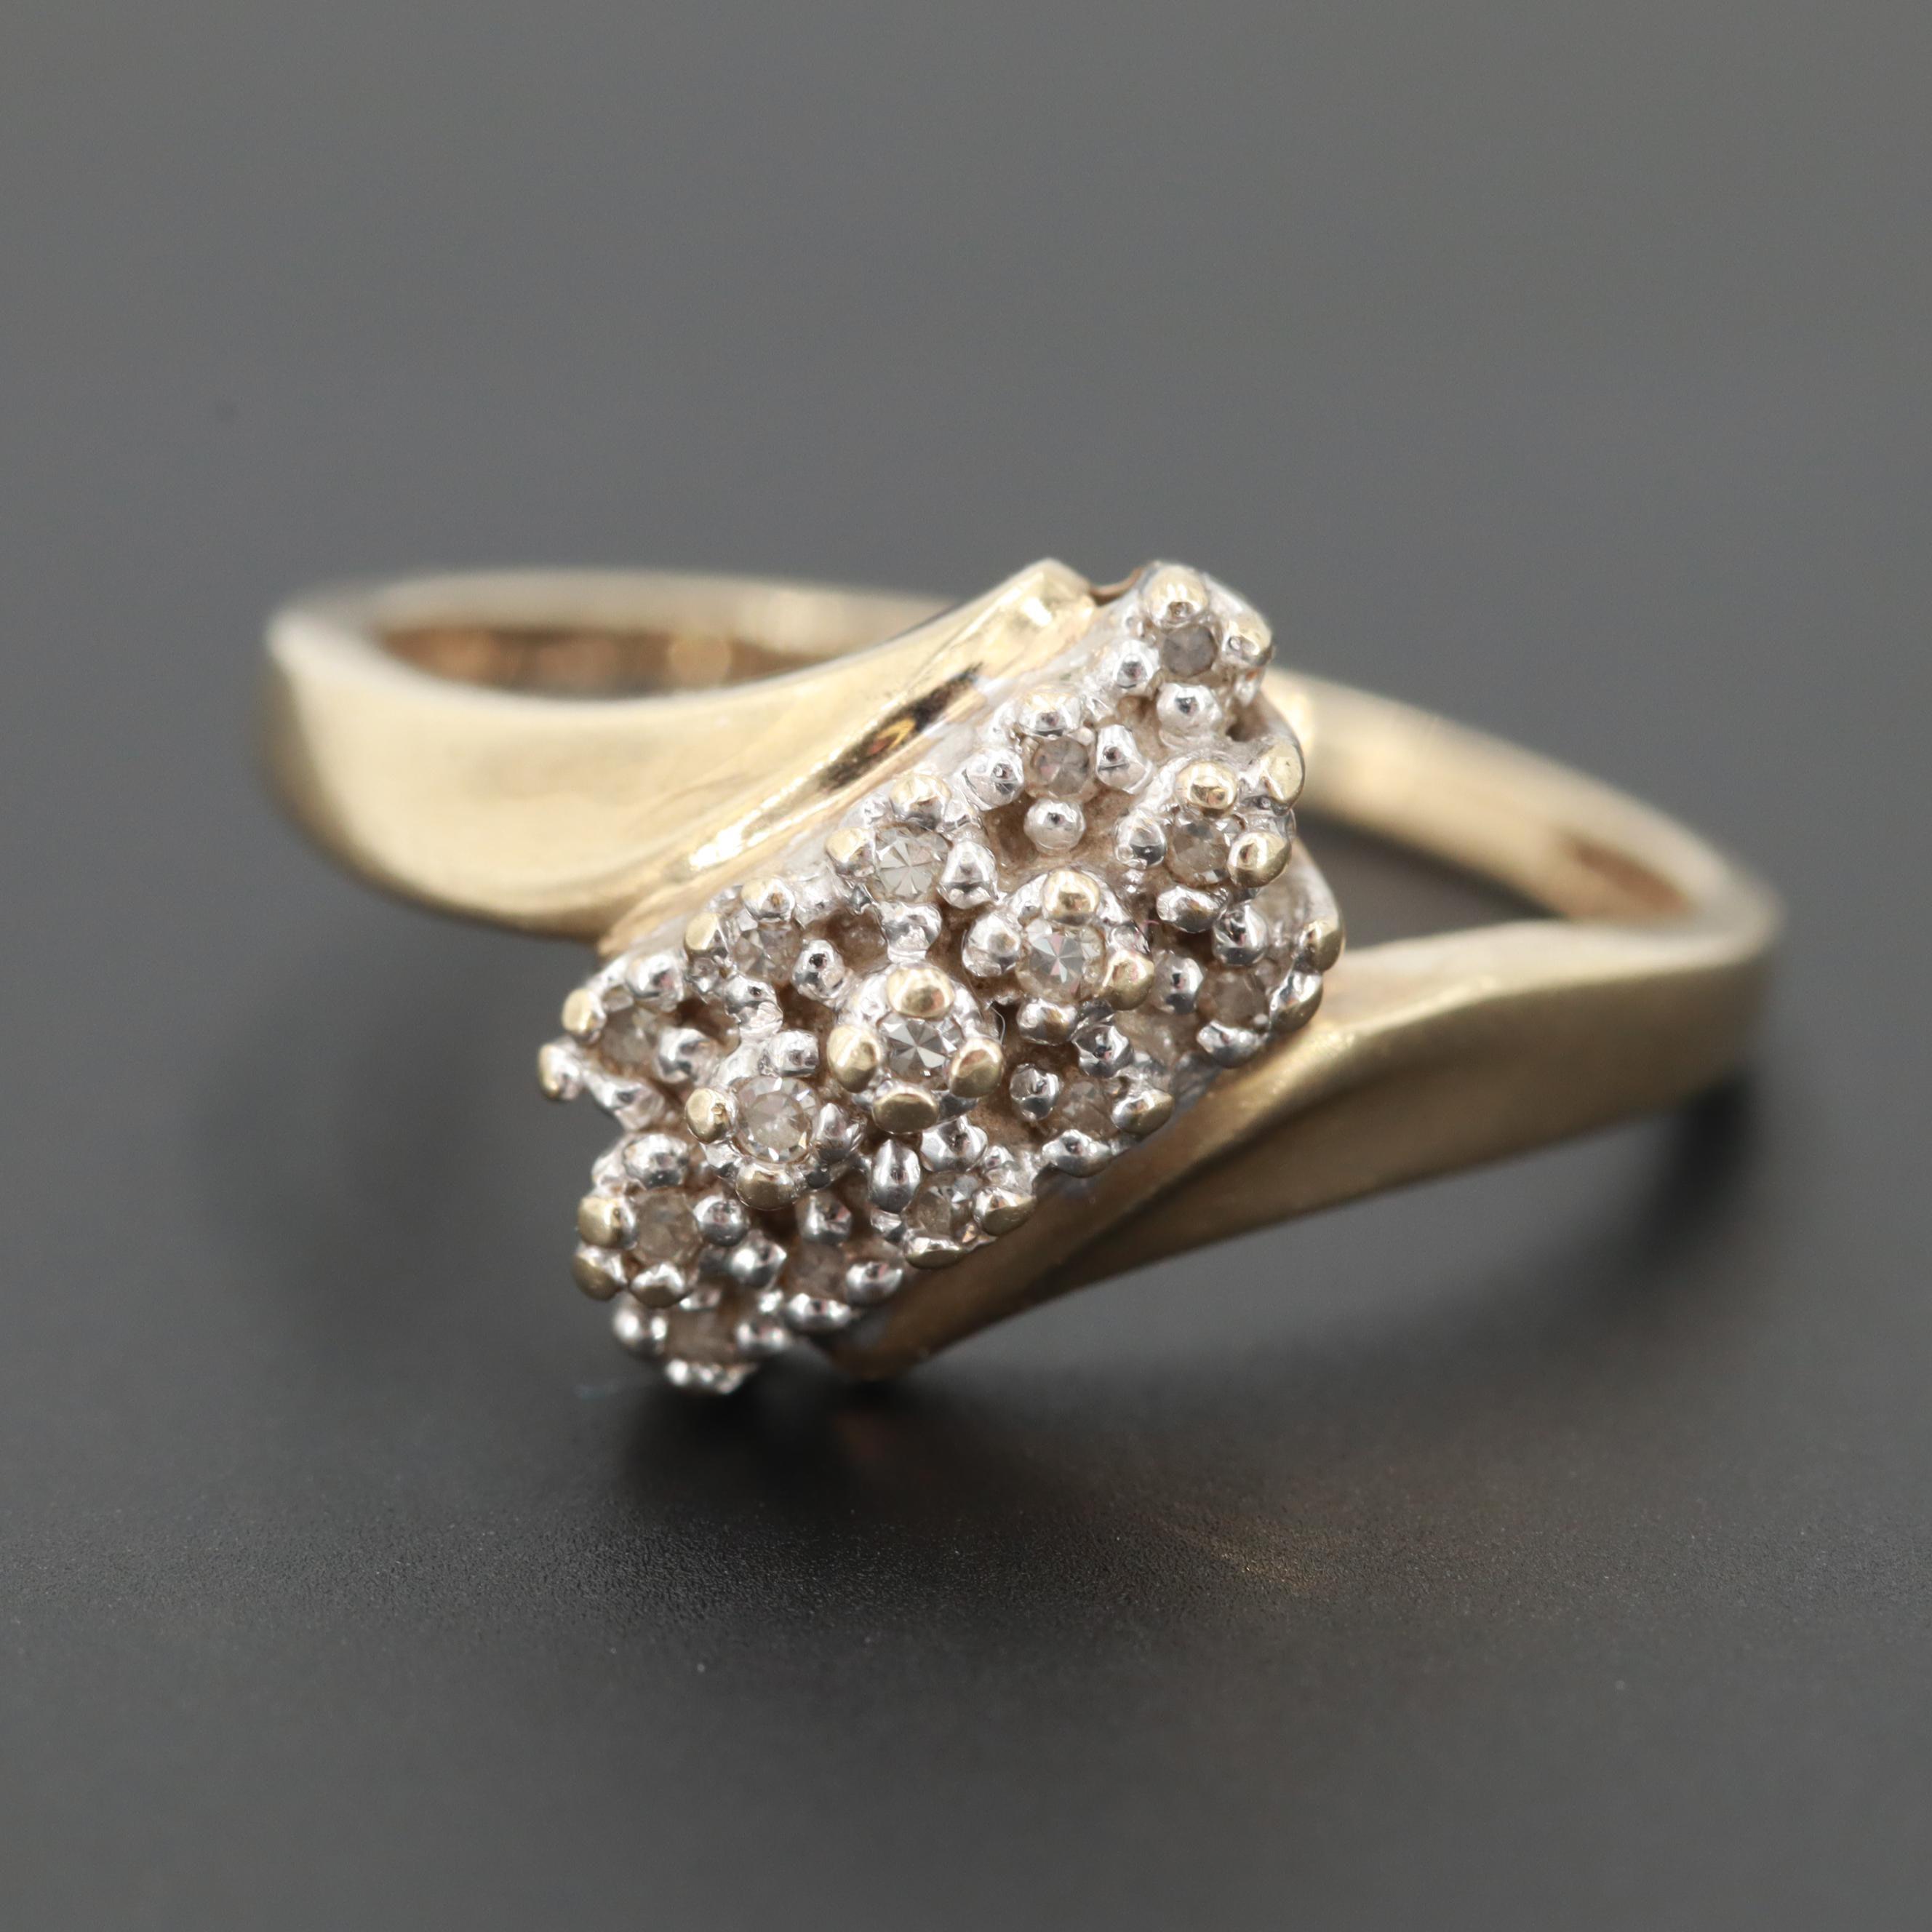 10K Yellow Gold Diamond Bypass Ring